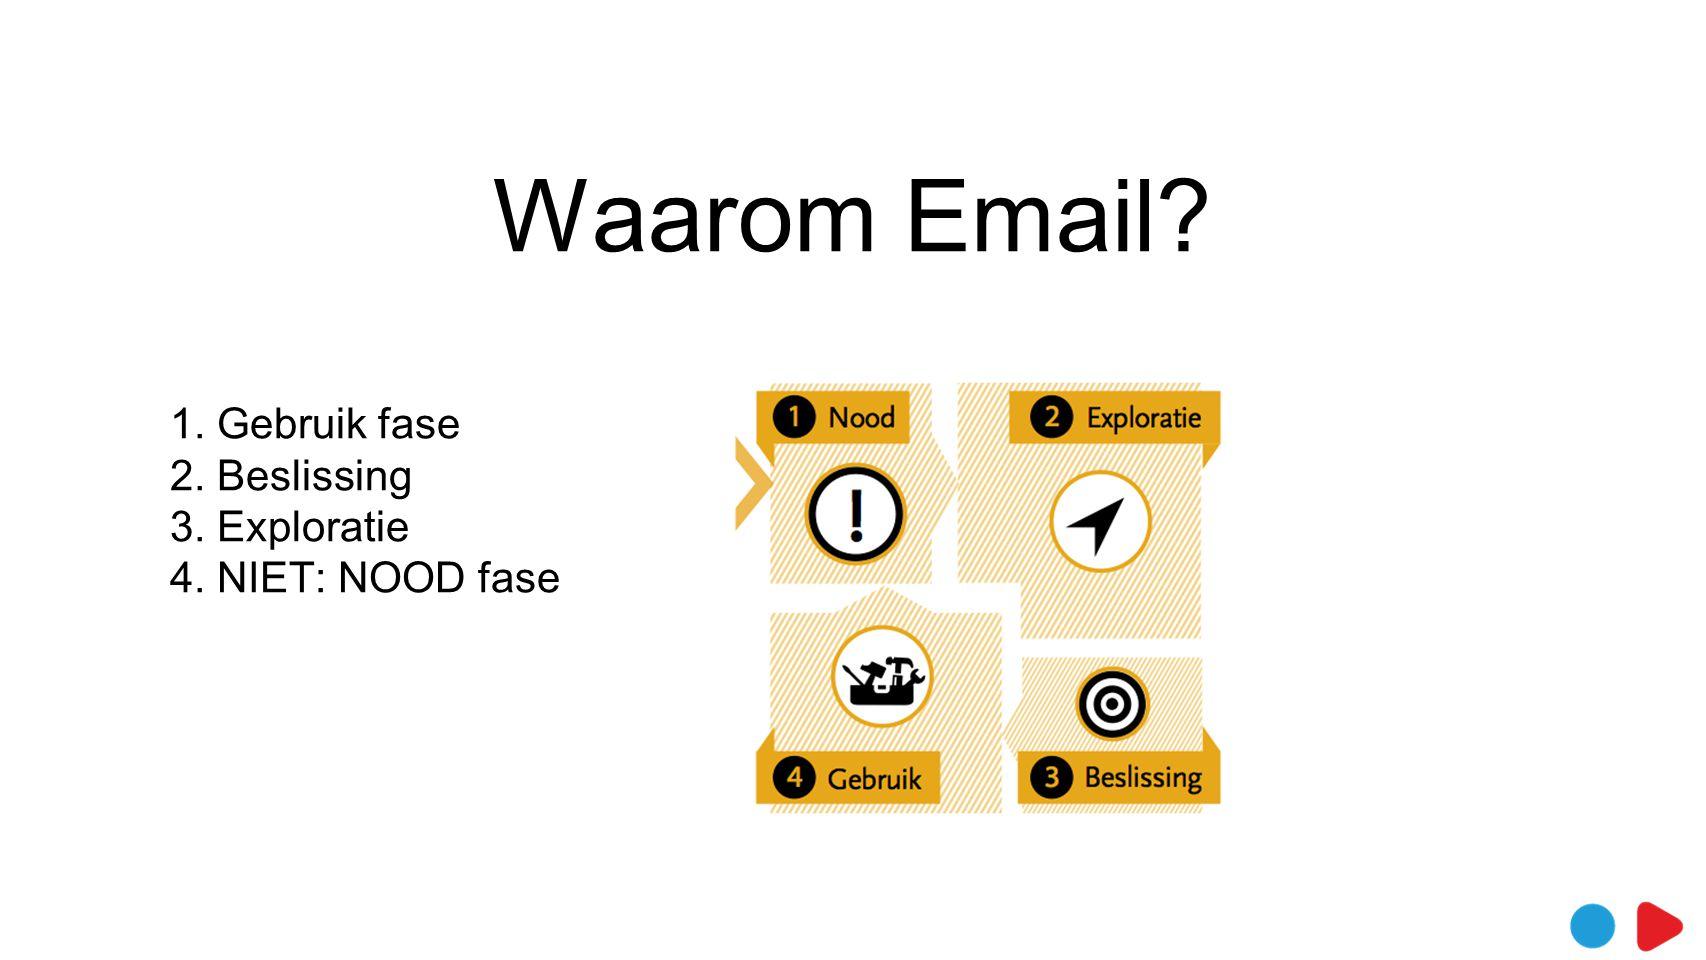 Waarom Email? 1. Gebruik fase 2. Beslissing 3. Exploratie 4. NIET: NOOD fase